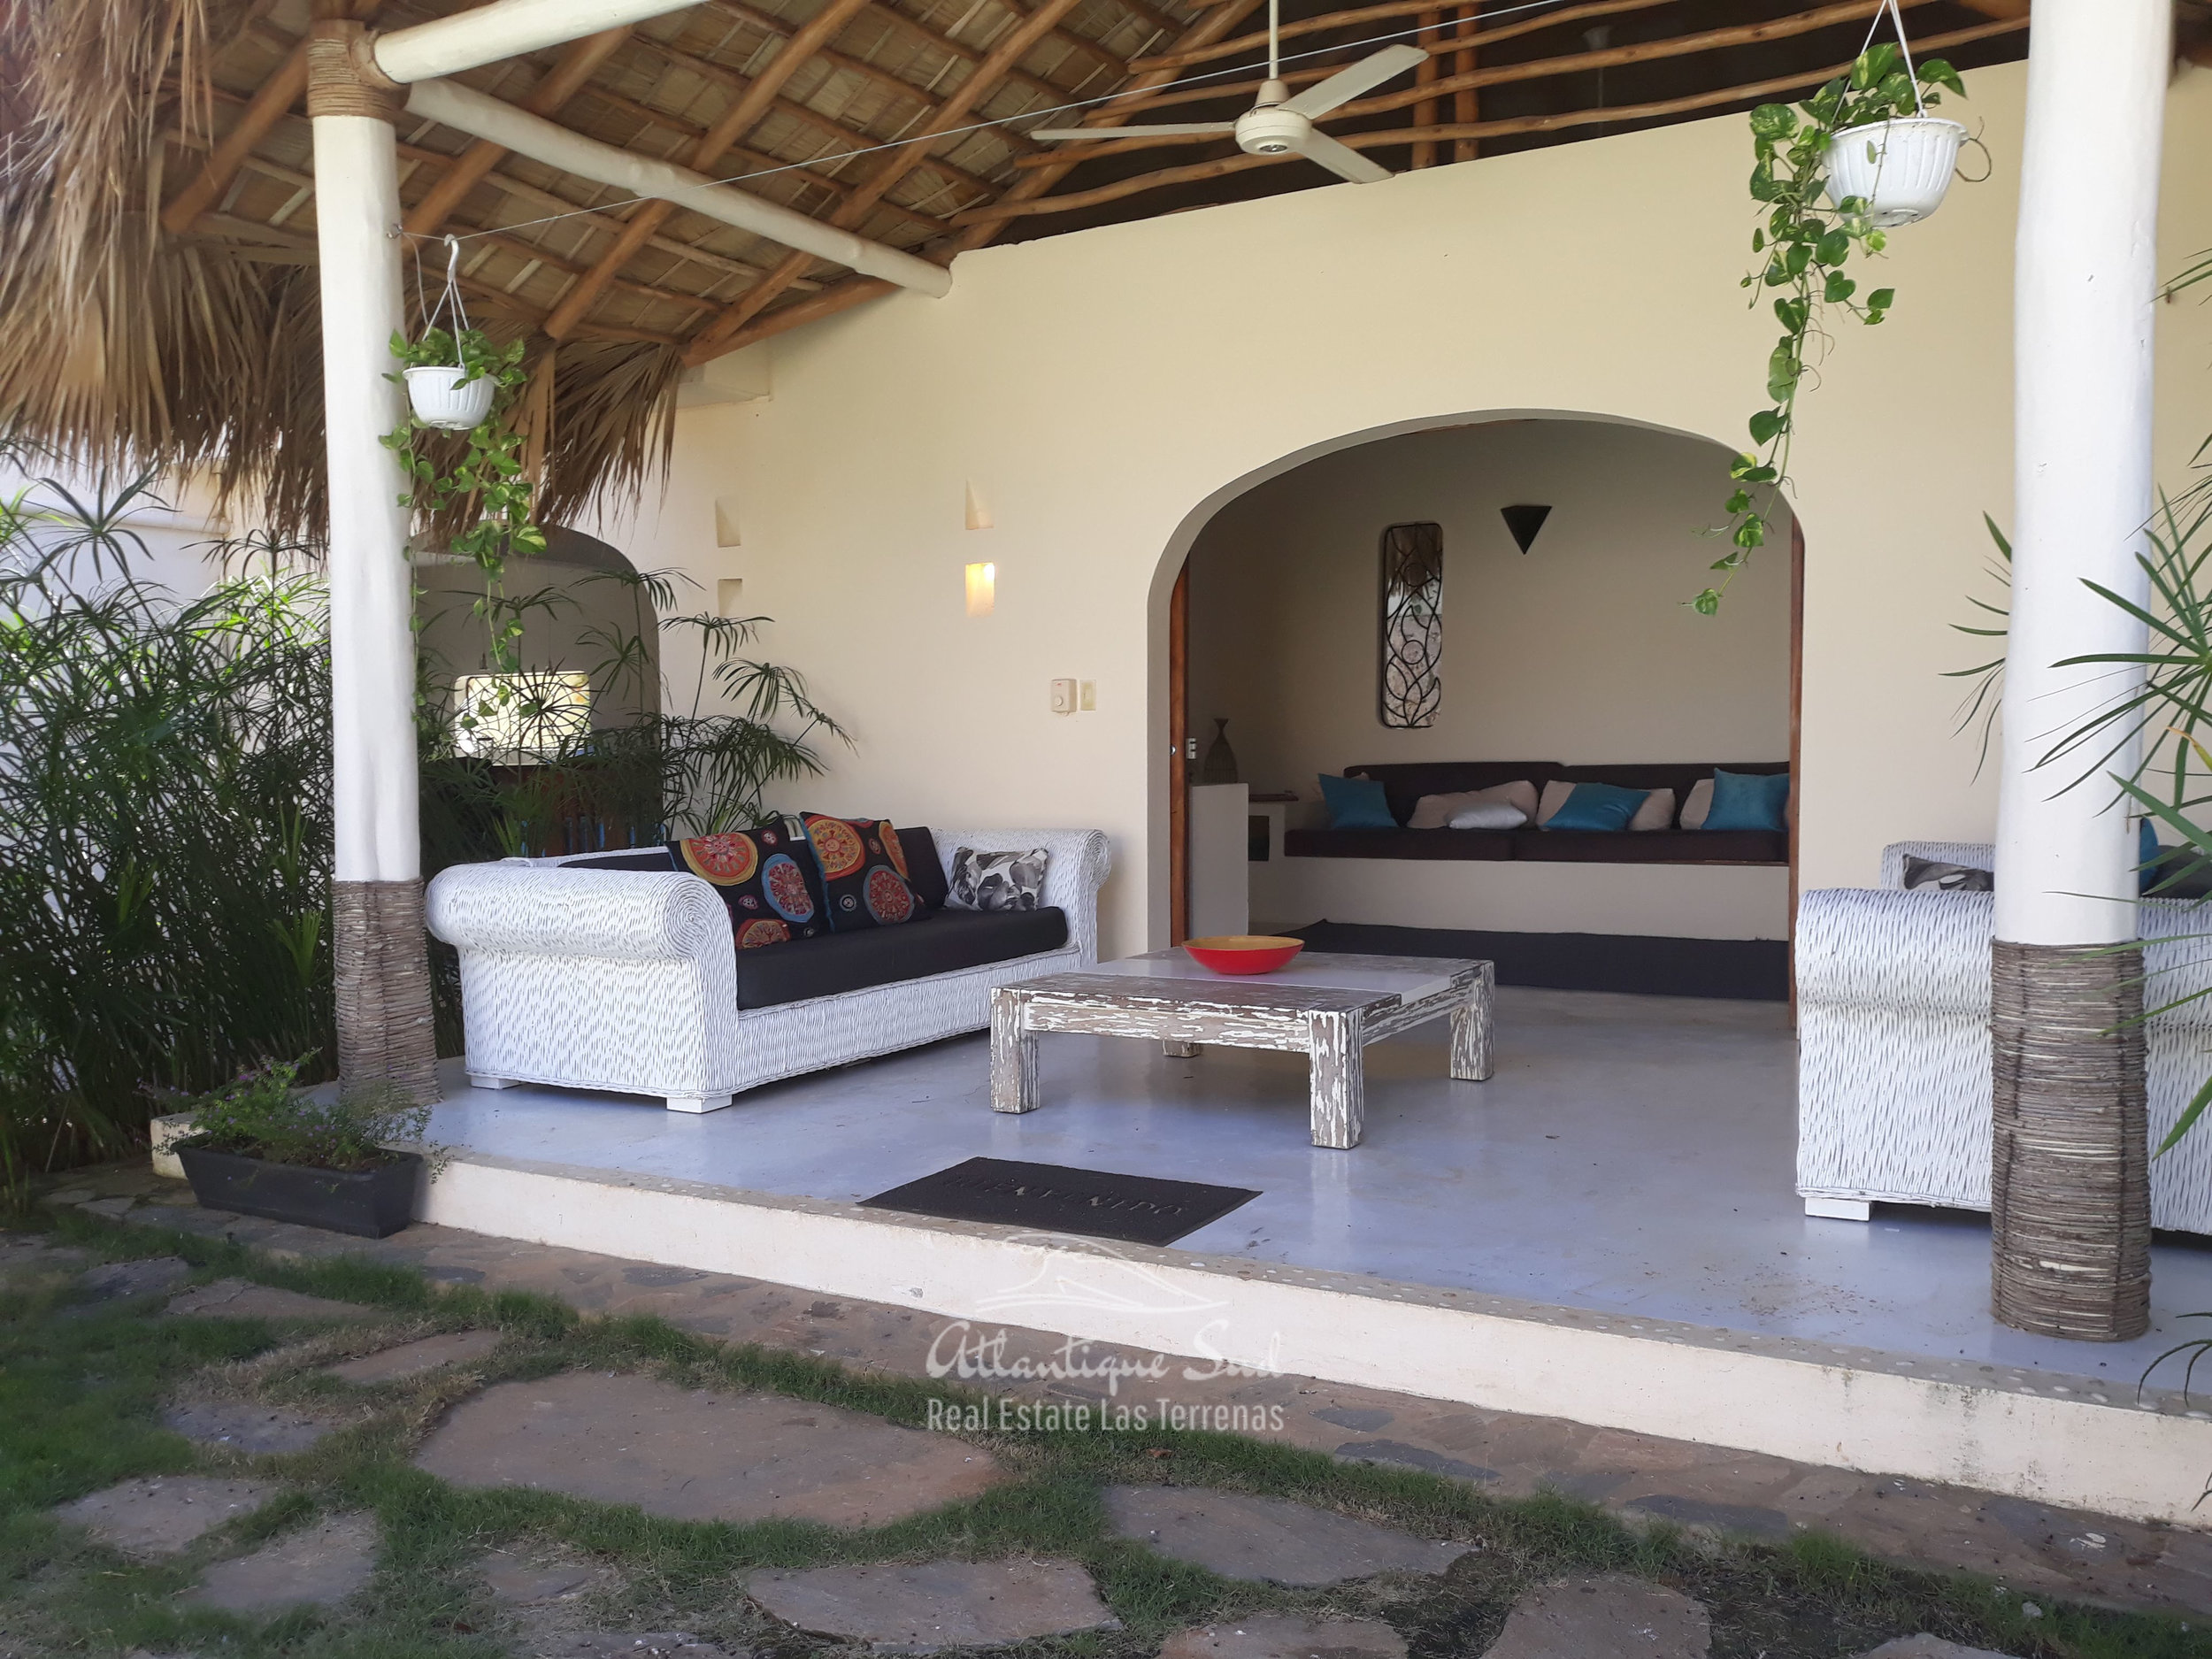 Authentic Caribbean Villa in quiet community in Real Estate Las Terrenas Atlantique Sud8.jpg